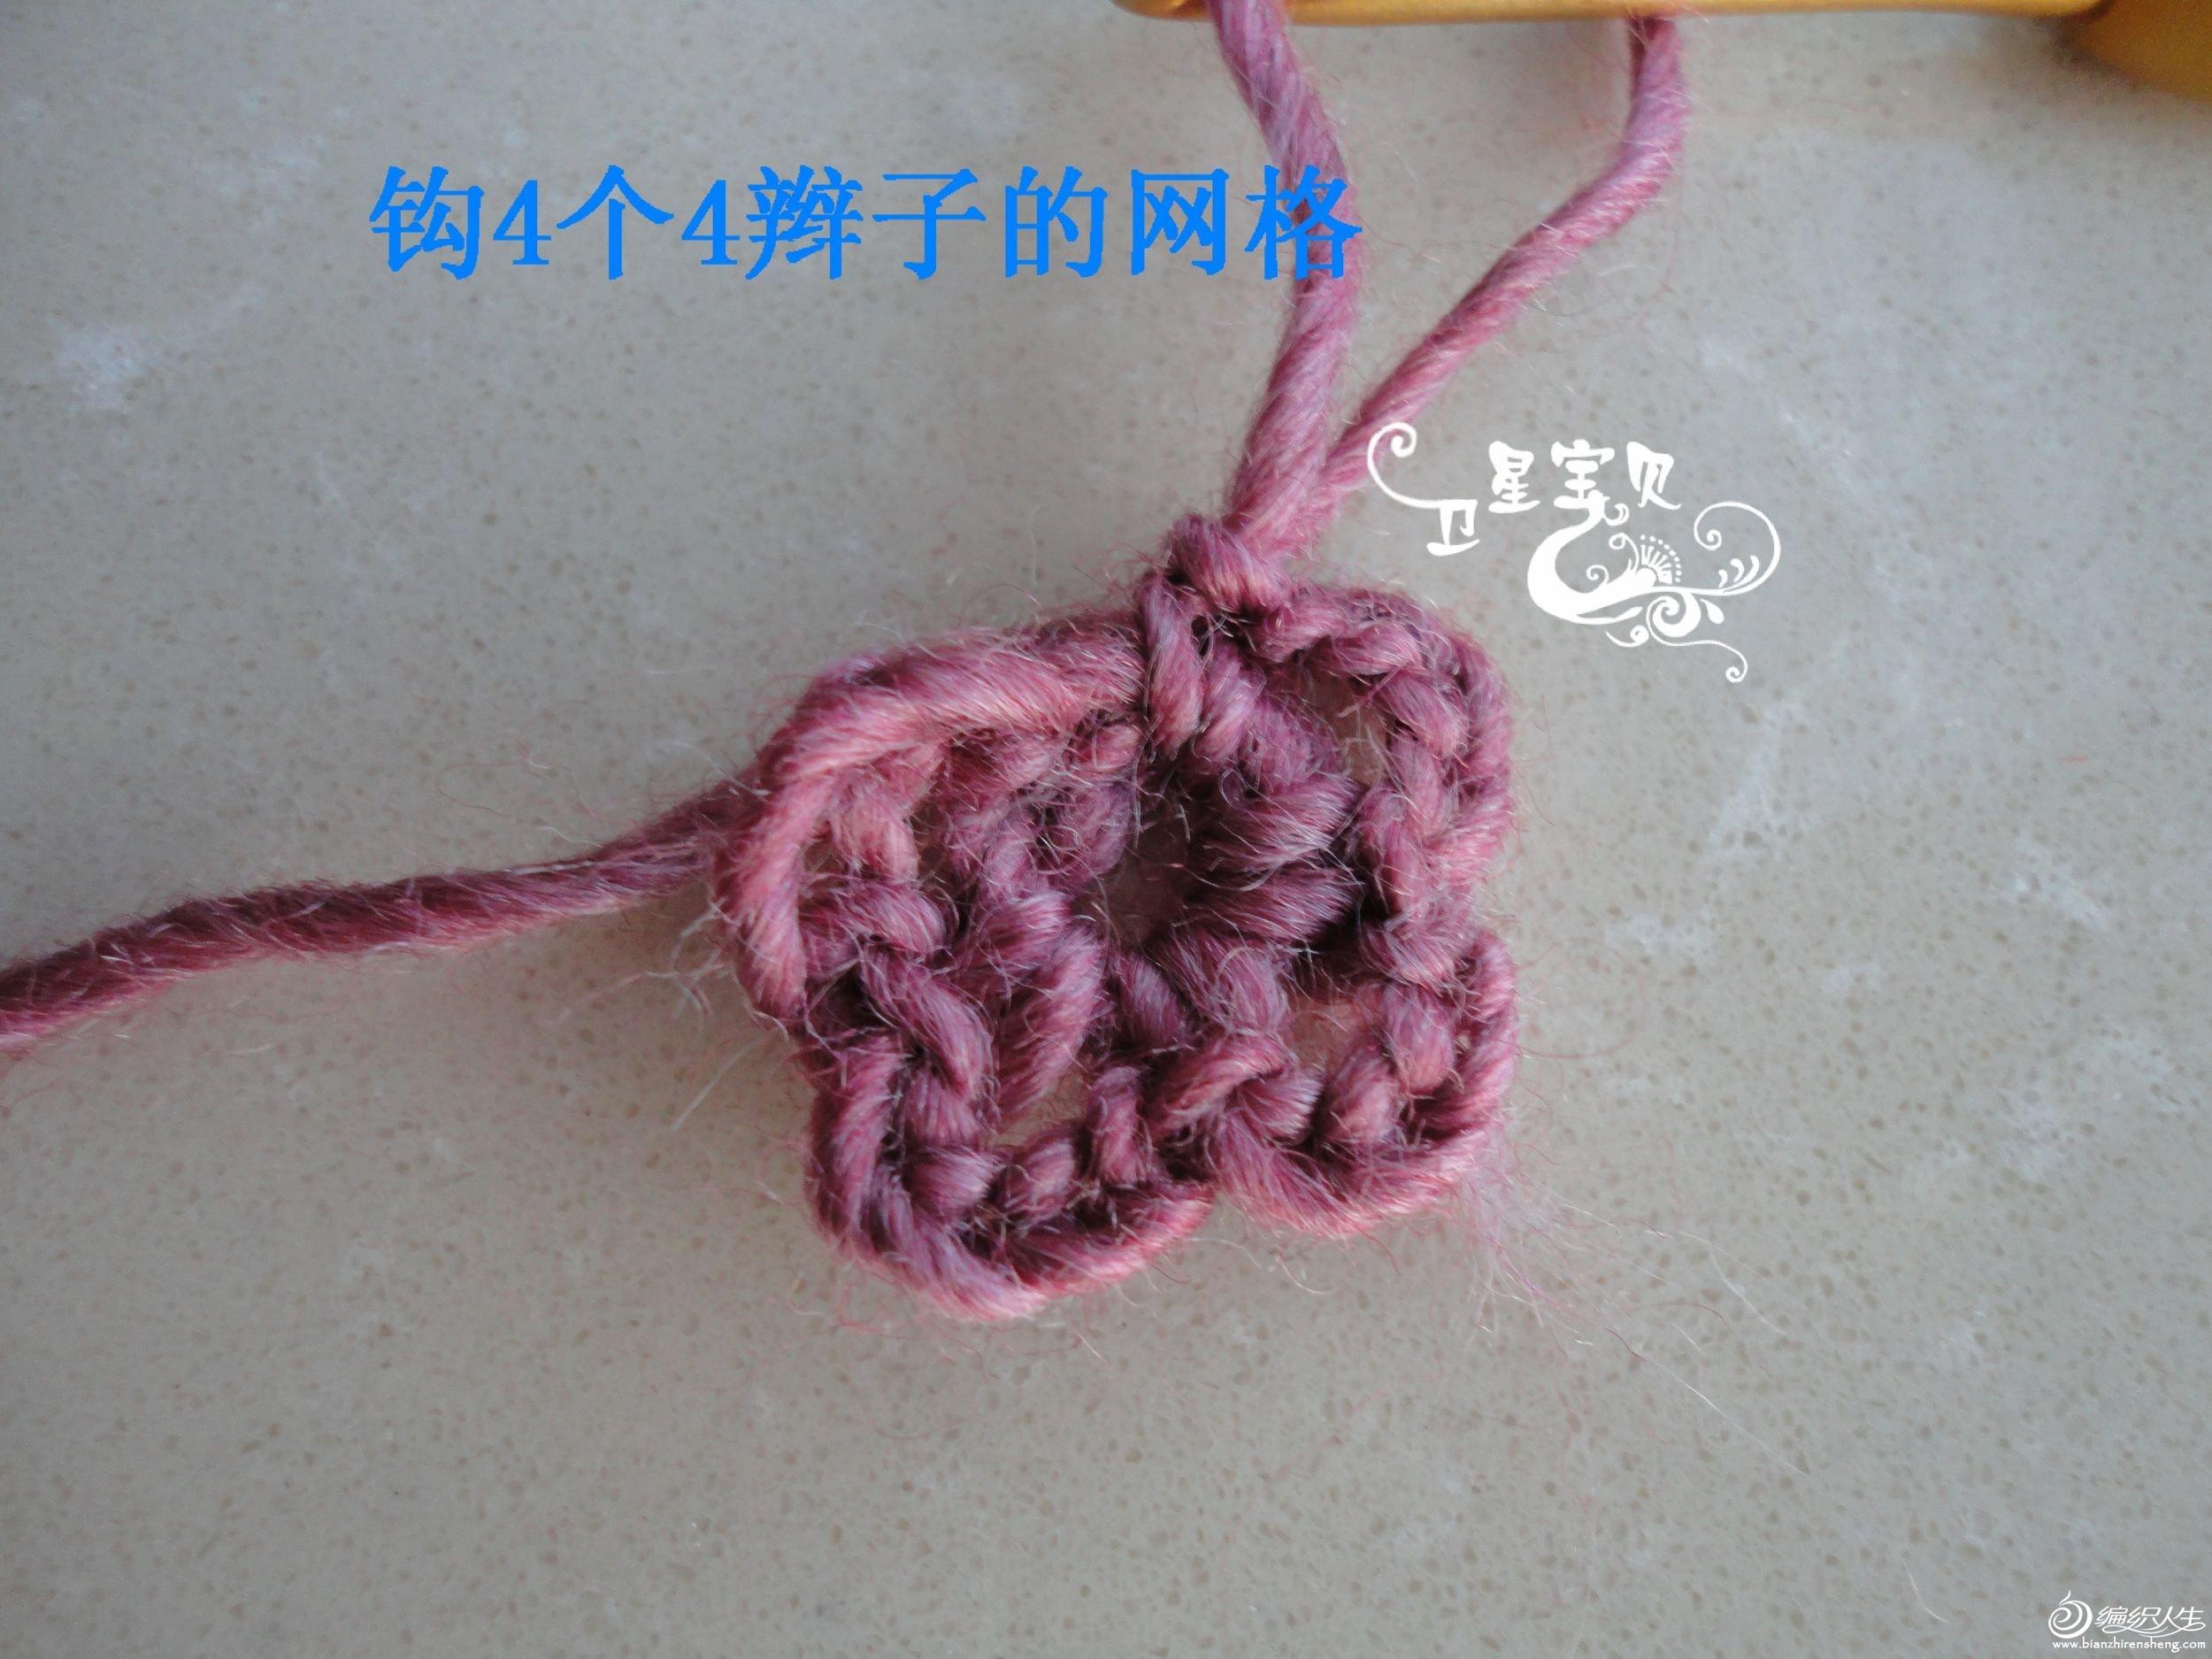 DSC07205.JPG